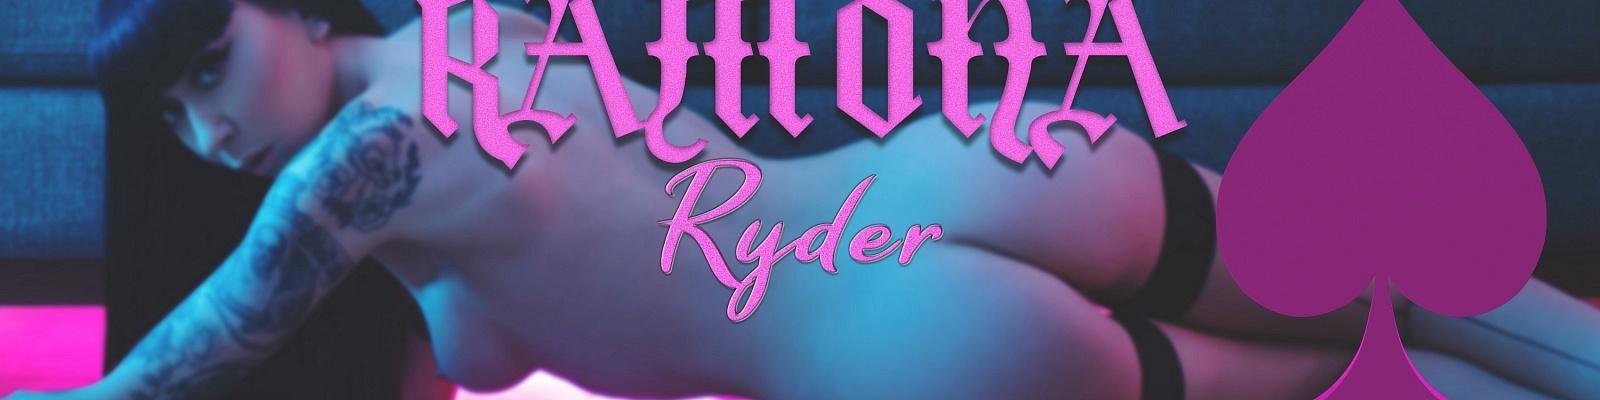 Mistress Ramona Ryder NYC & SF's Cover Photo